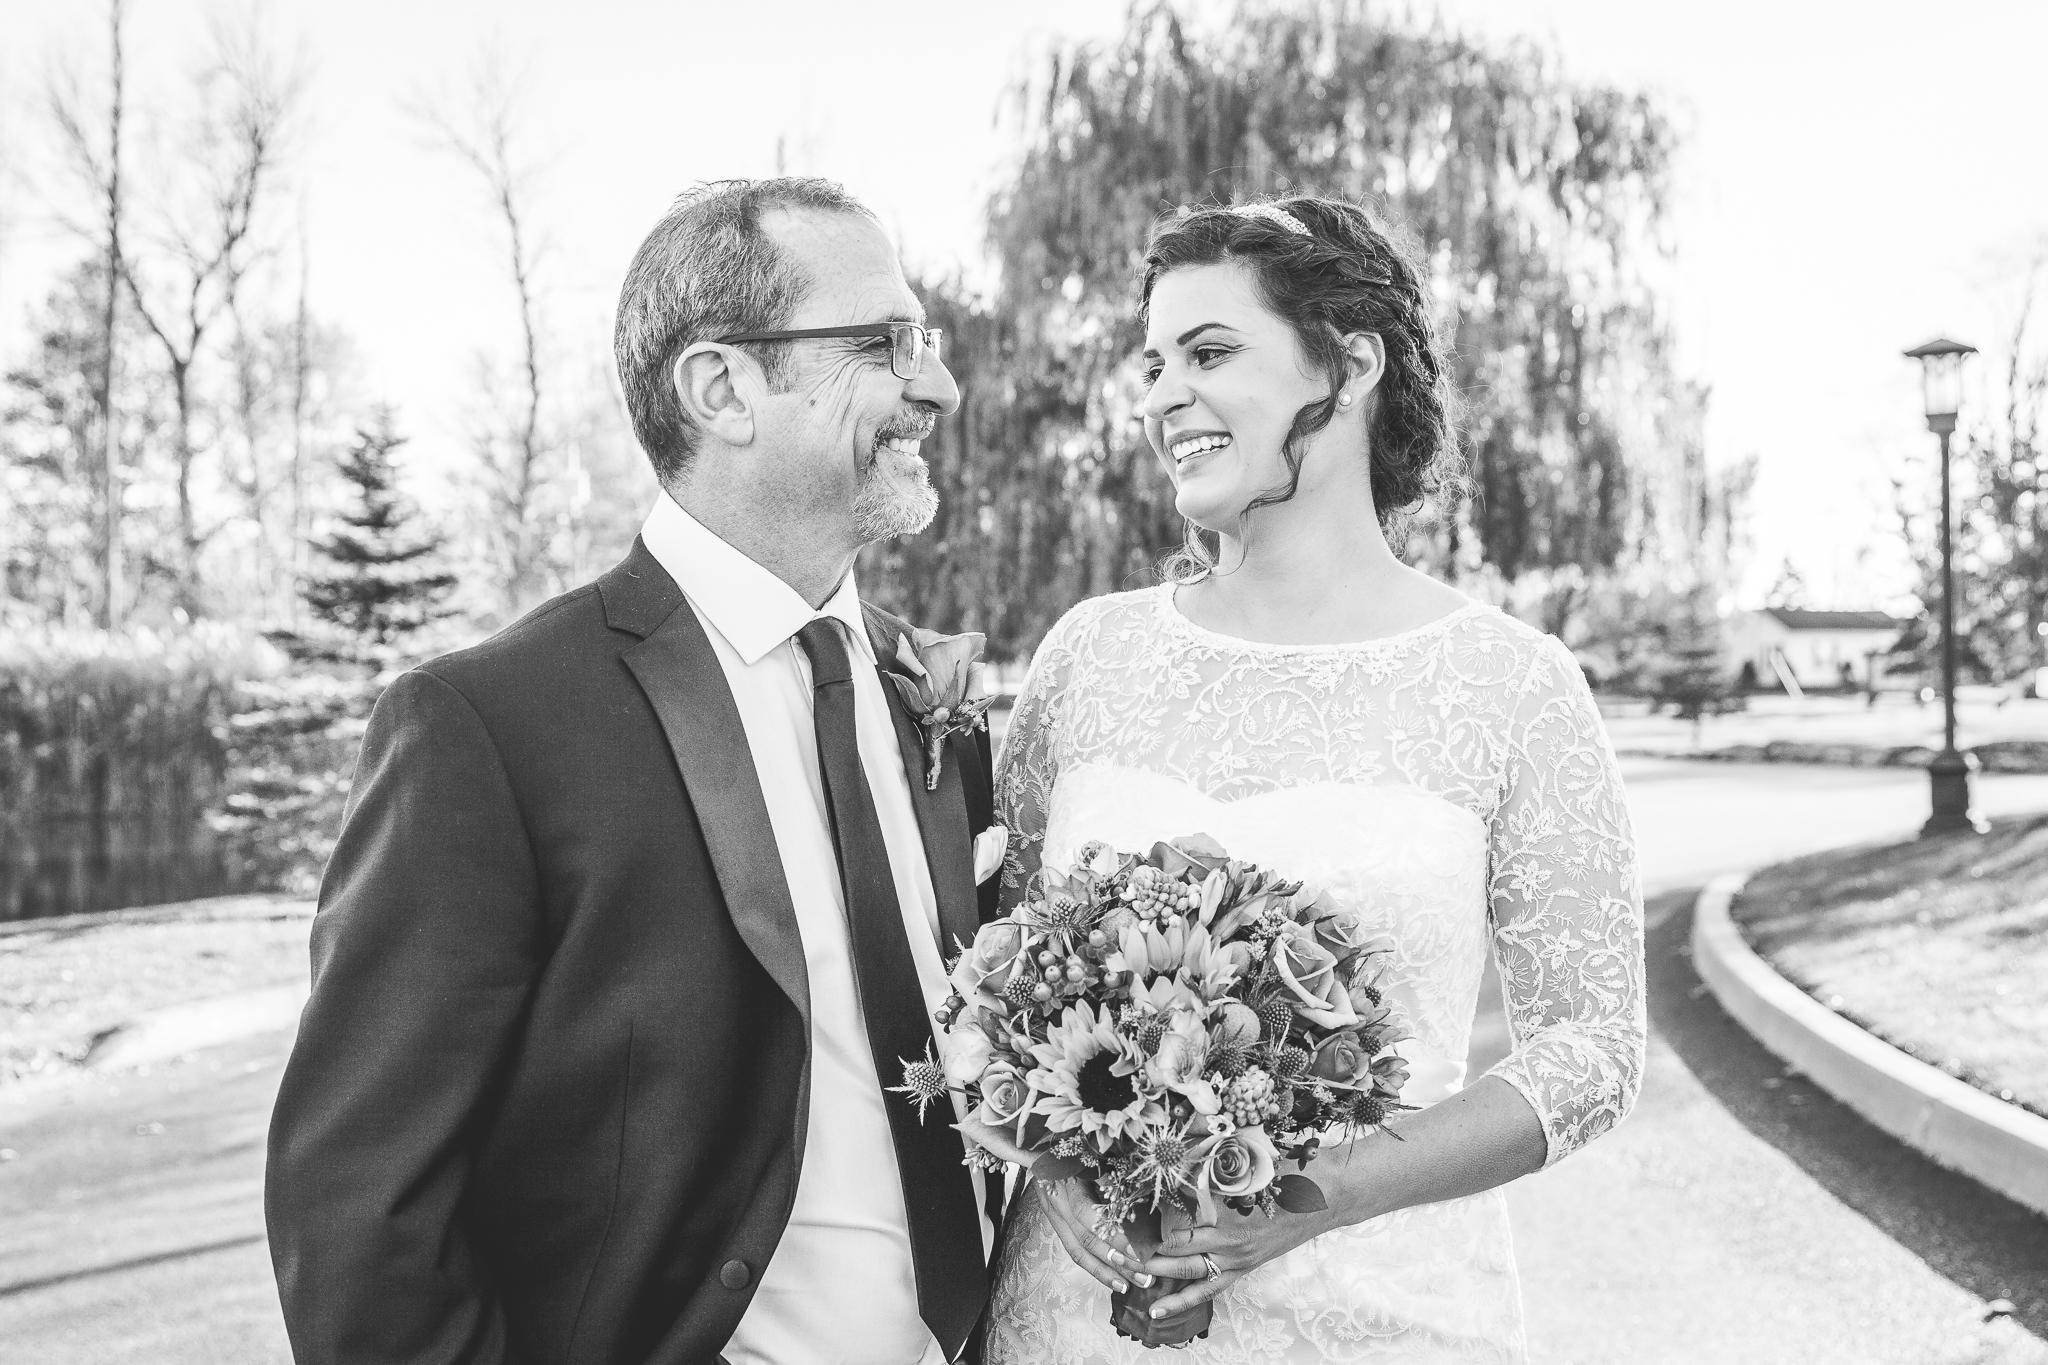 camuglia-whomstudio-chelsea_and_andy-nycphotographer-wedding-brooklyn-buffalo-timberlodge-037-0229.jpg